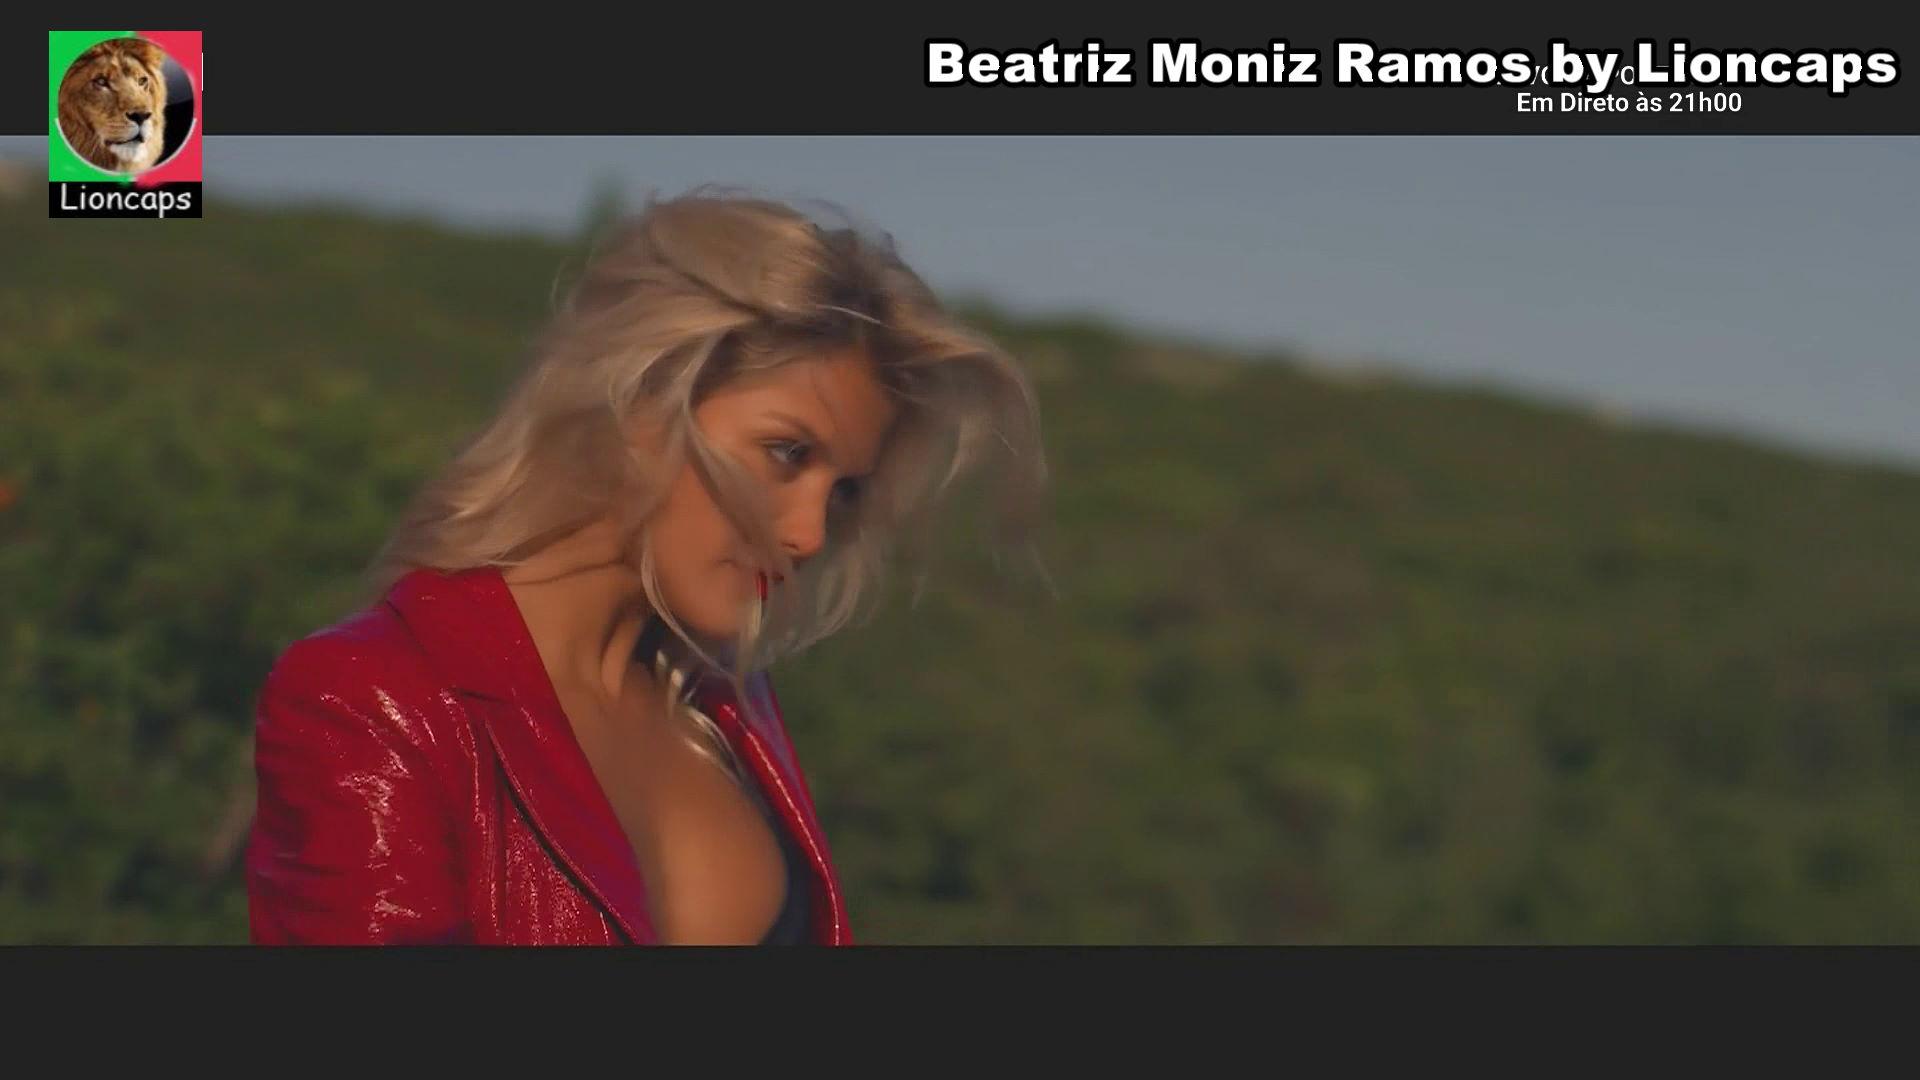 205977341_beatriz_moniz_ramos_vs191224_1342_122_374lo.JPG